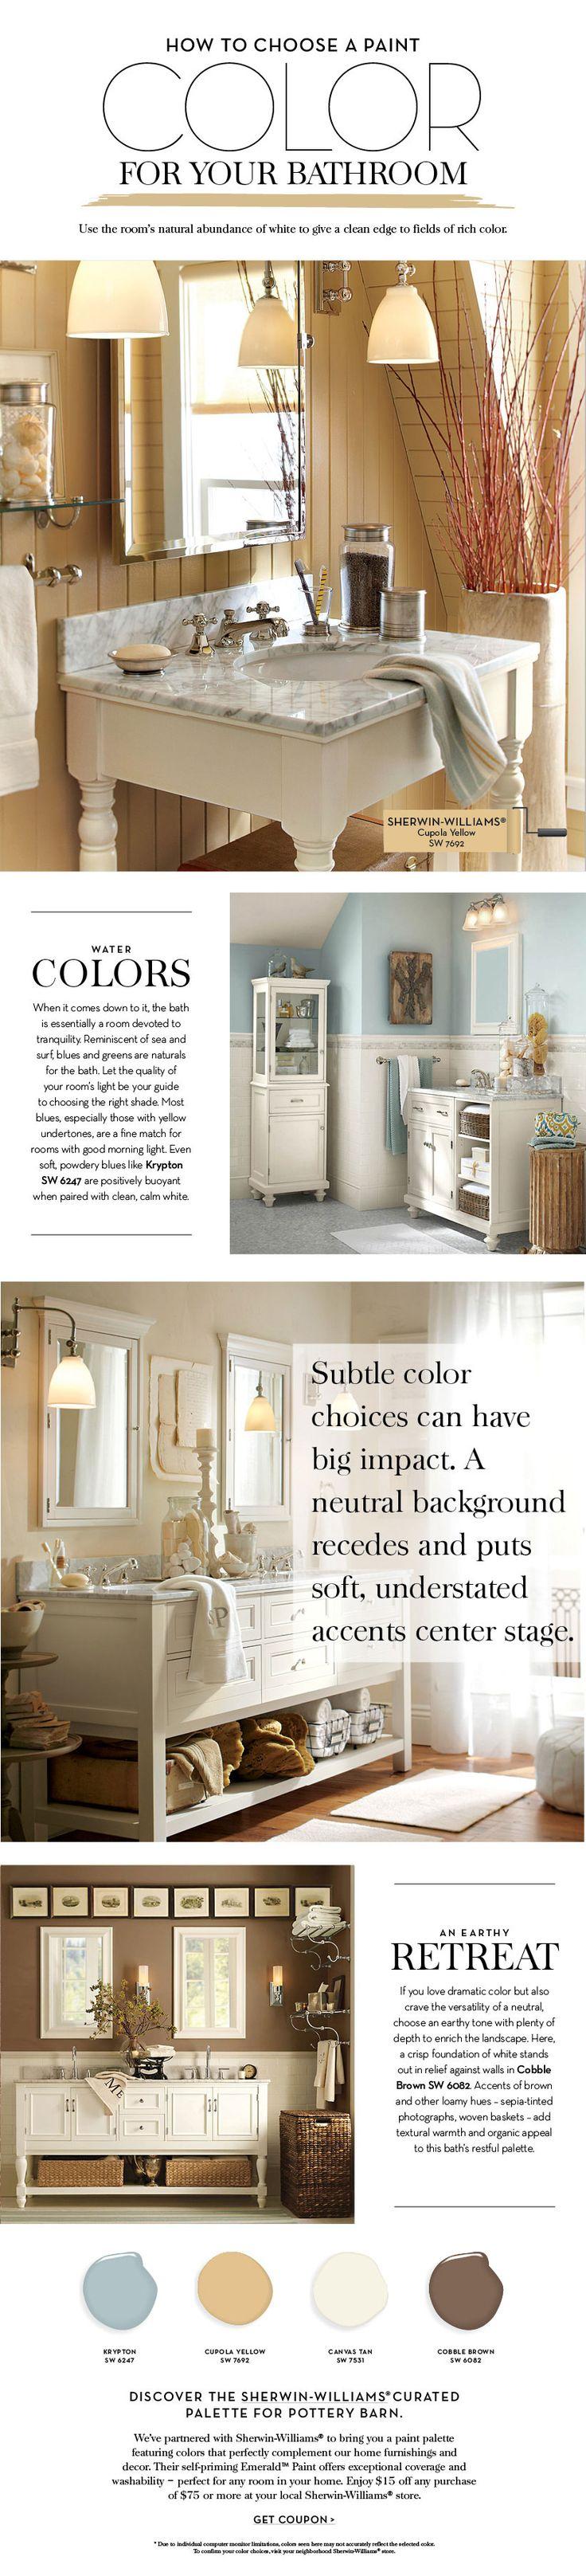 543 Best Images About Master Bedroom Bathroom Ideas On Pinterest Pallet Wedding Master